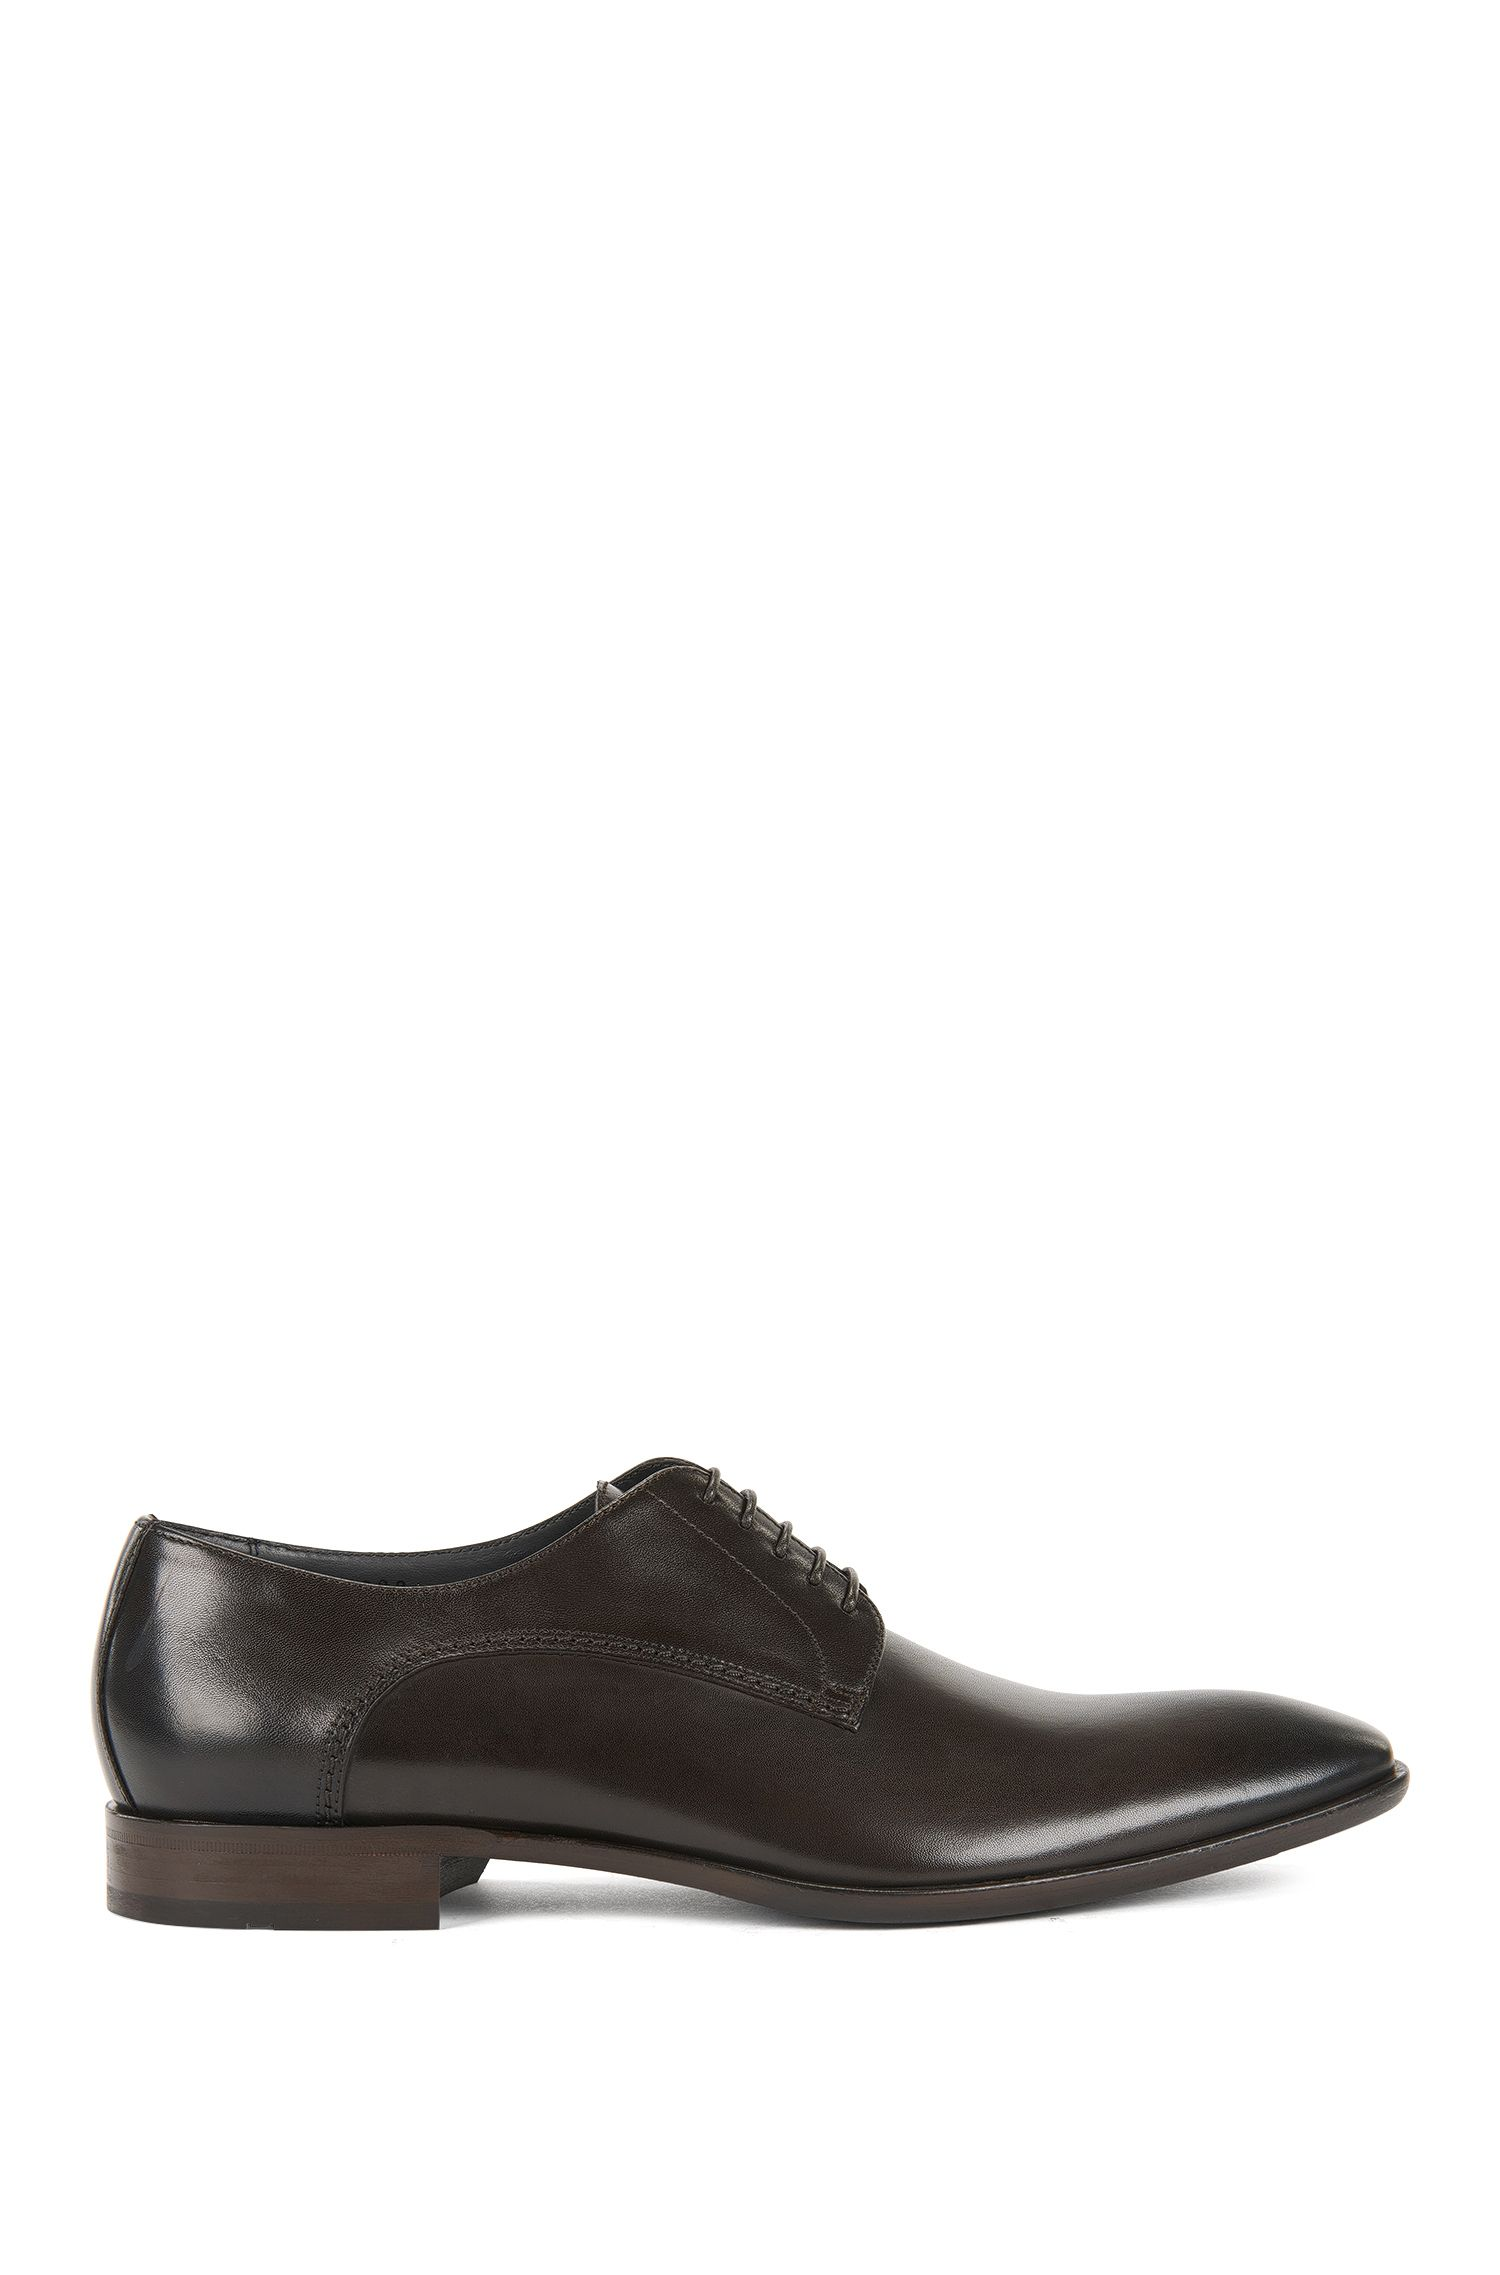 Leather Derby Dress Shoe   Carmons